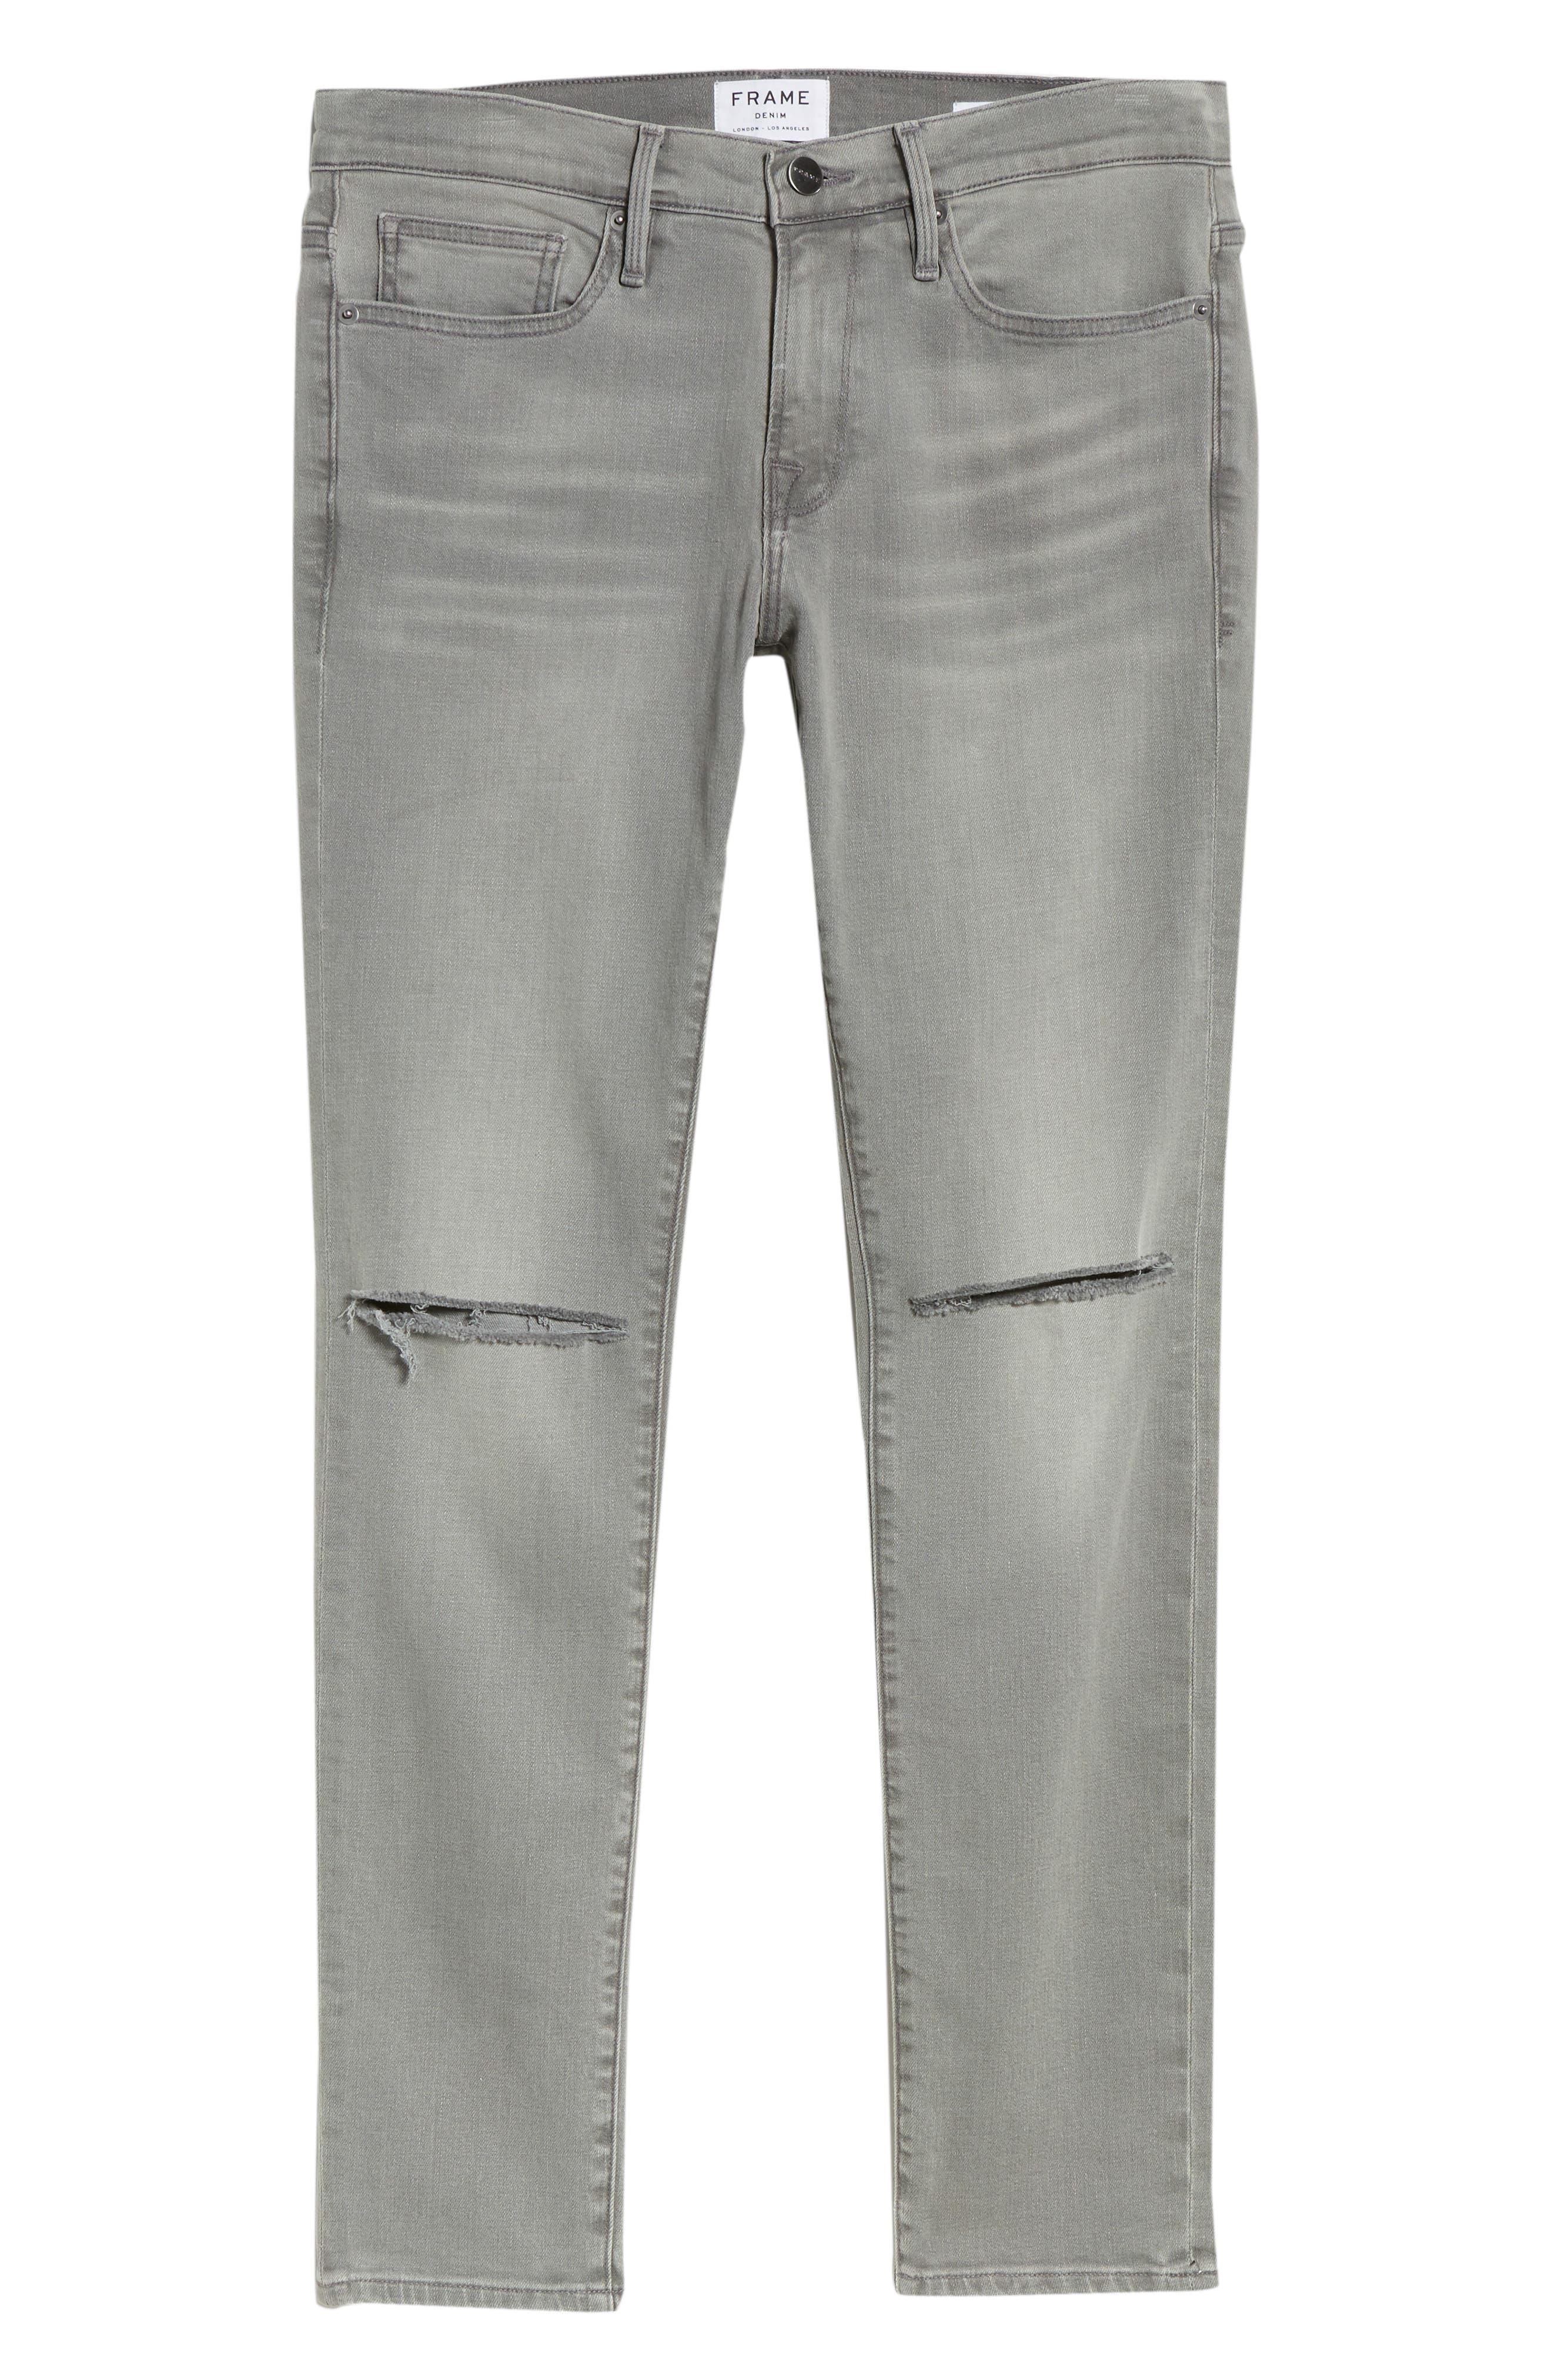 L'Homme Skinny Fit Jeans,                             Alternate thumbnail 6, color,                             030